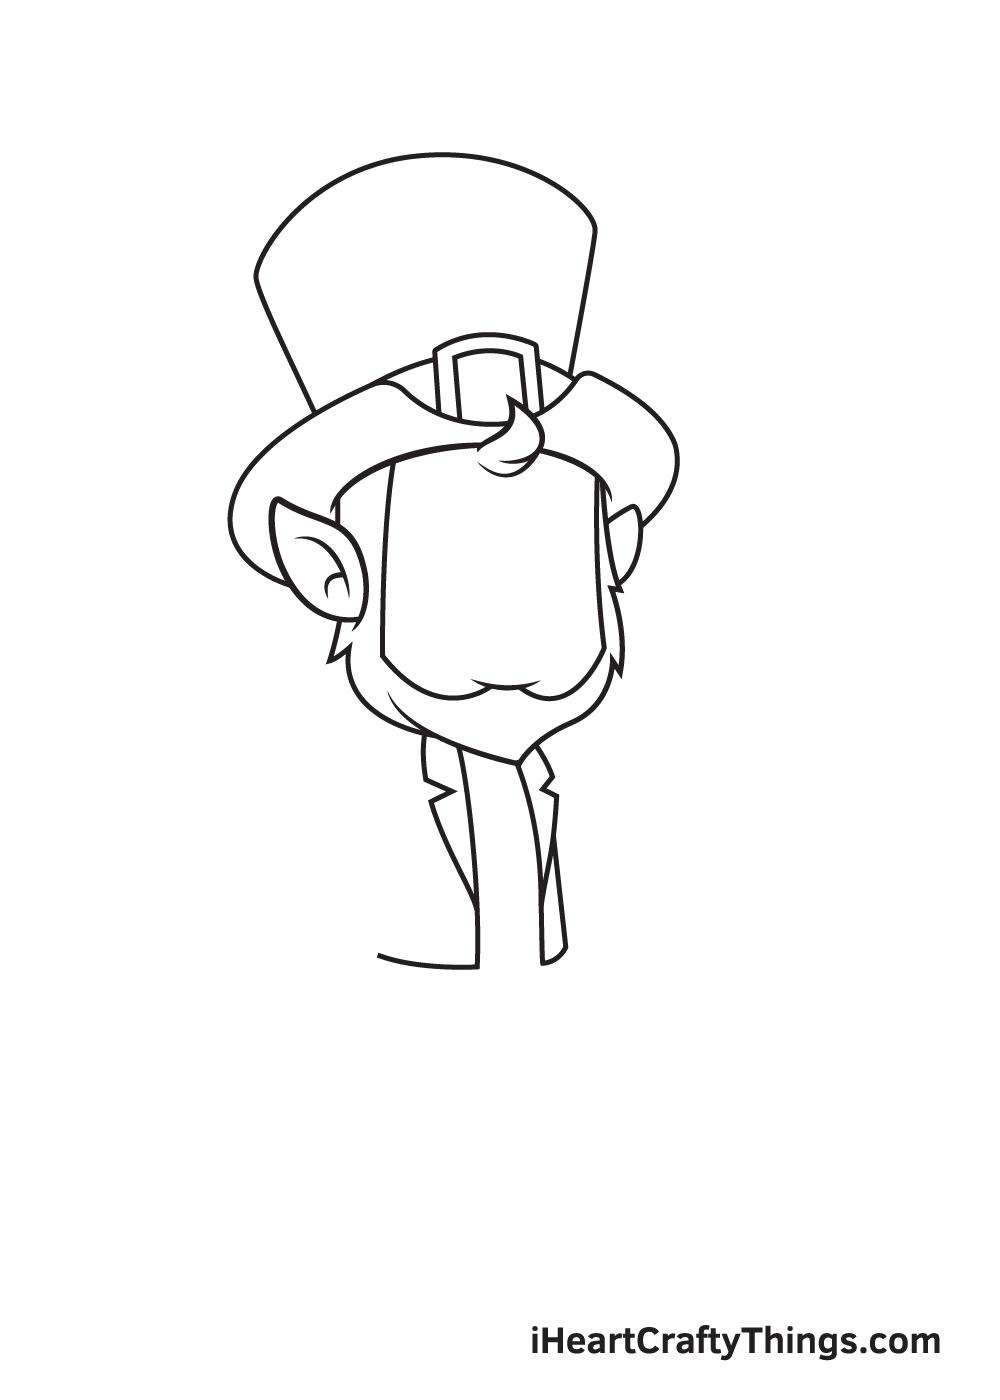 Leprechaun Drawing – Step 2